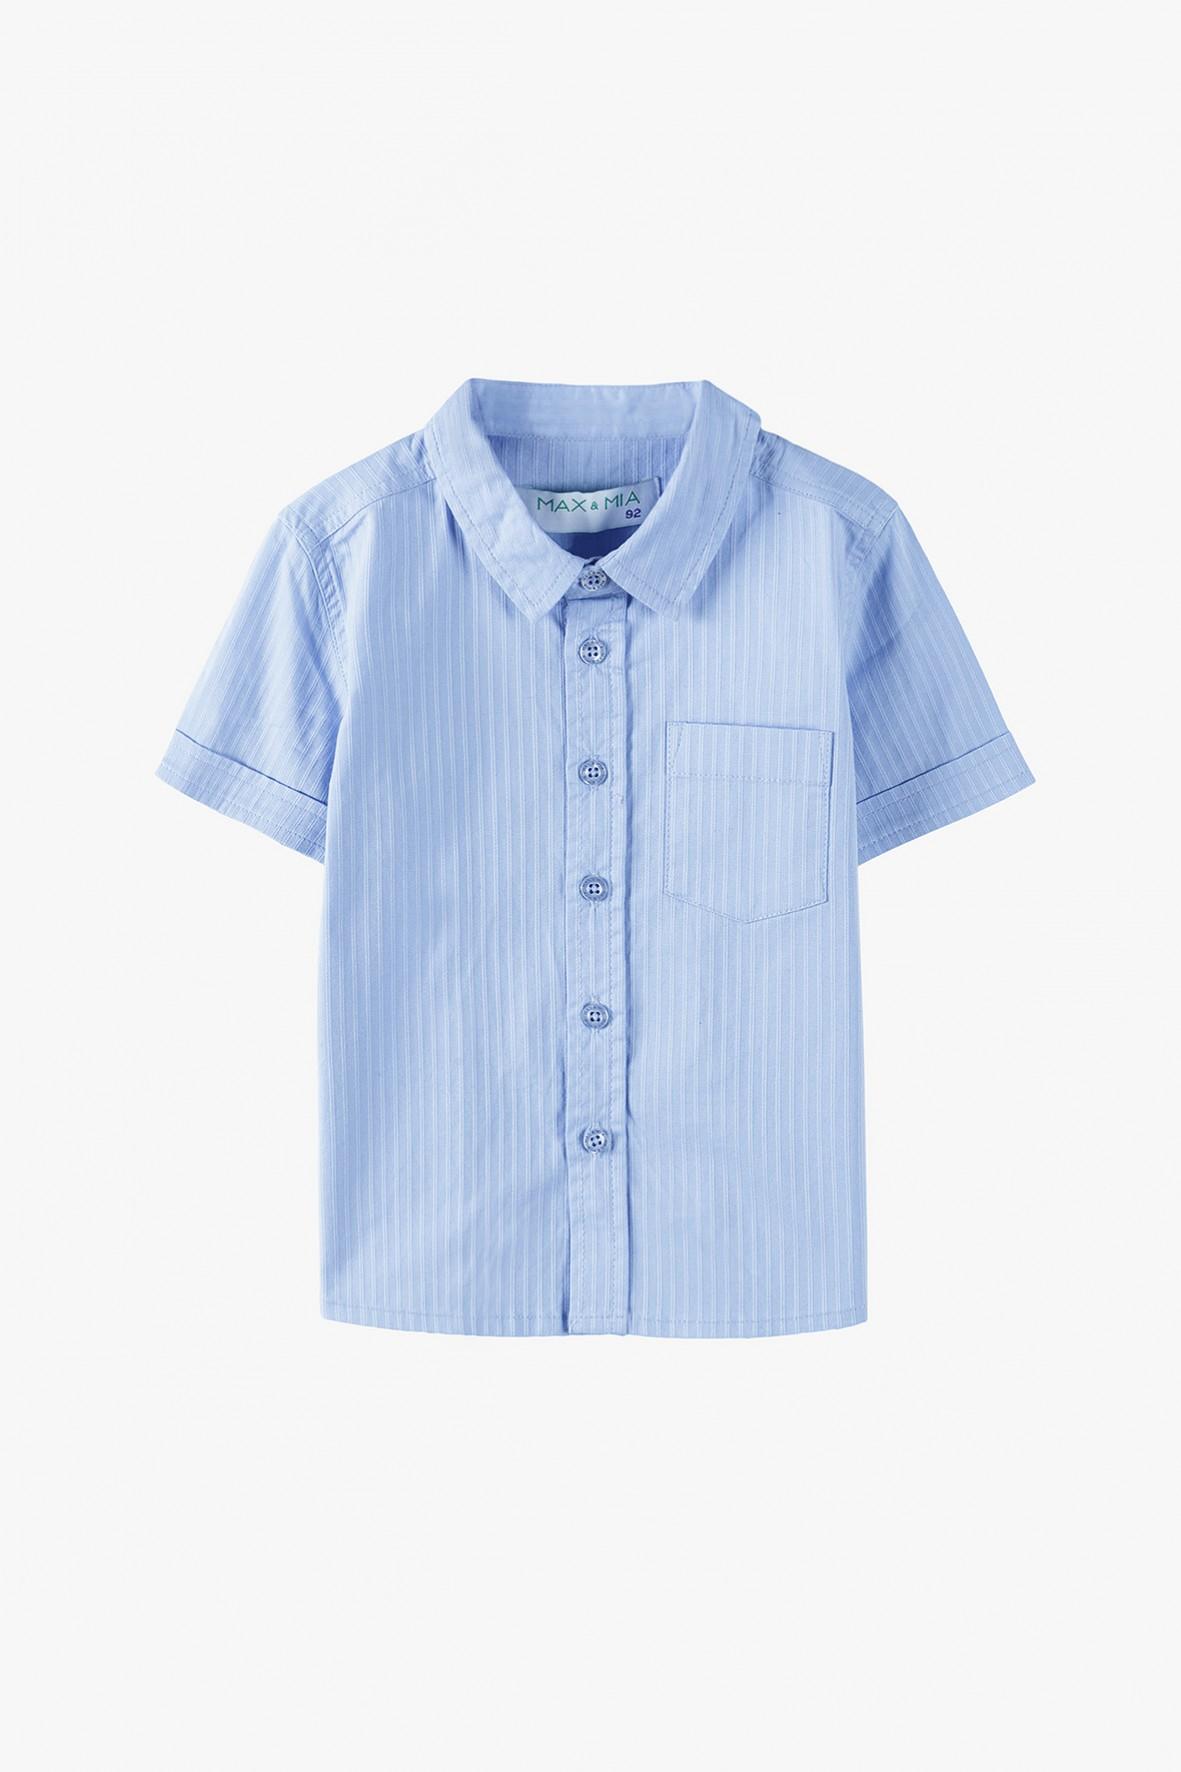 Elegancka koszula chłopięca z krótkim rękawem - niebieska